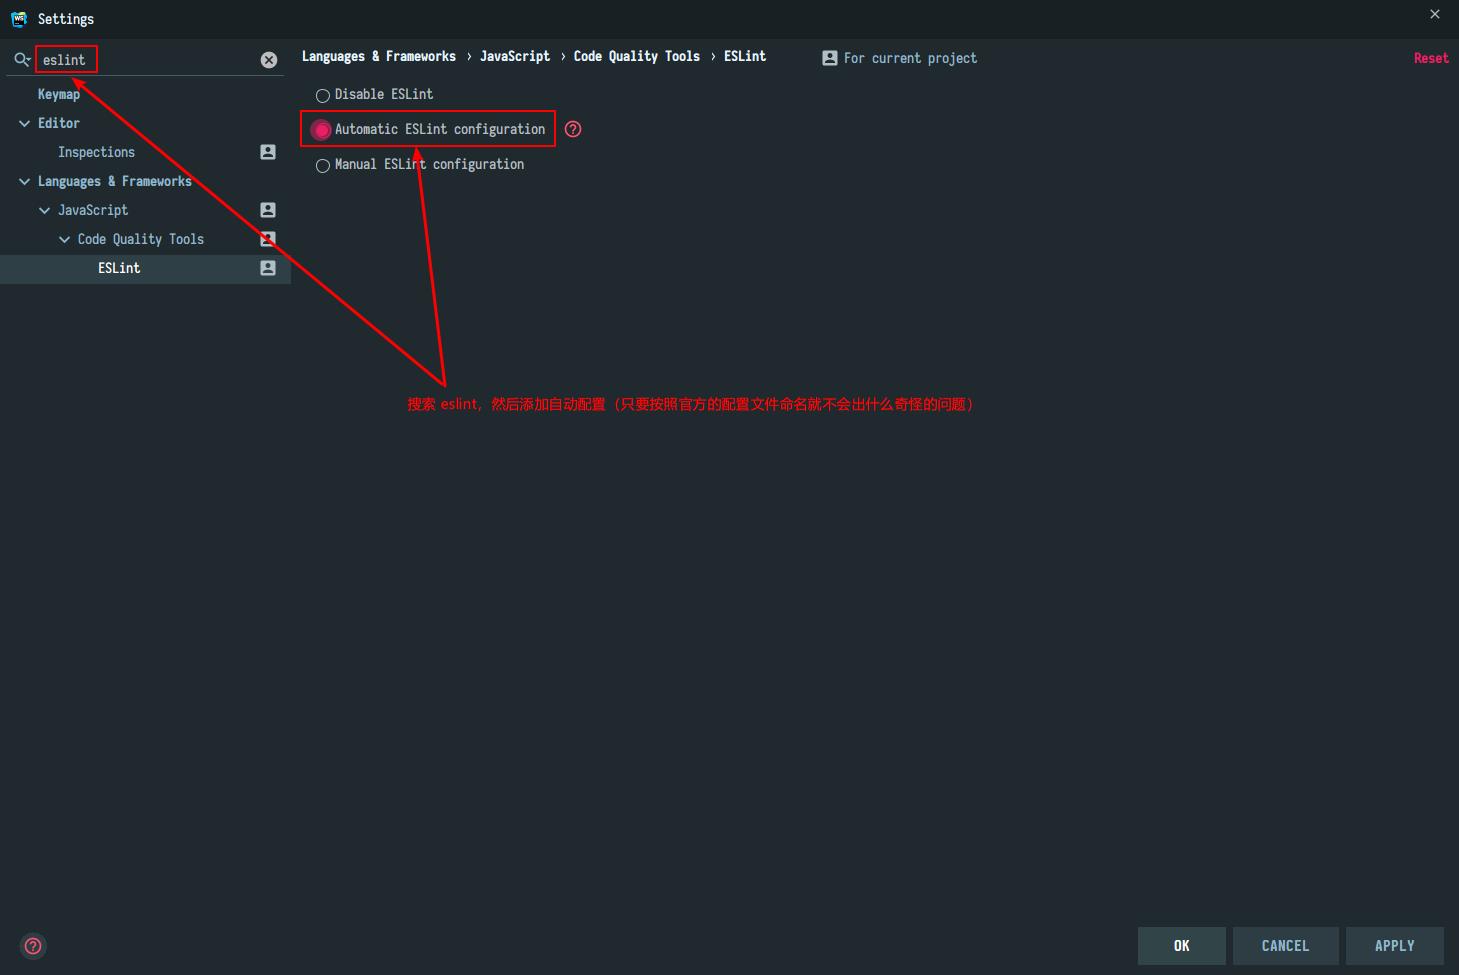 WebStorm 使用 ESLint